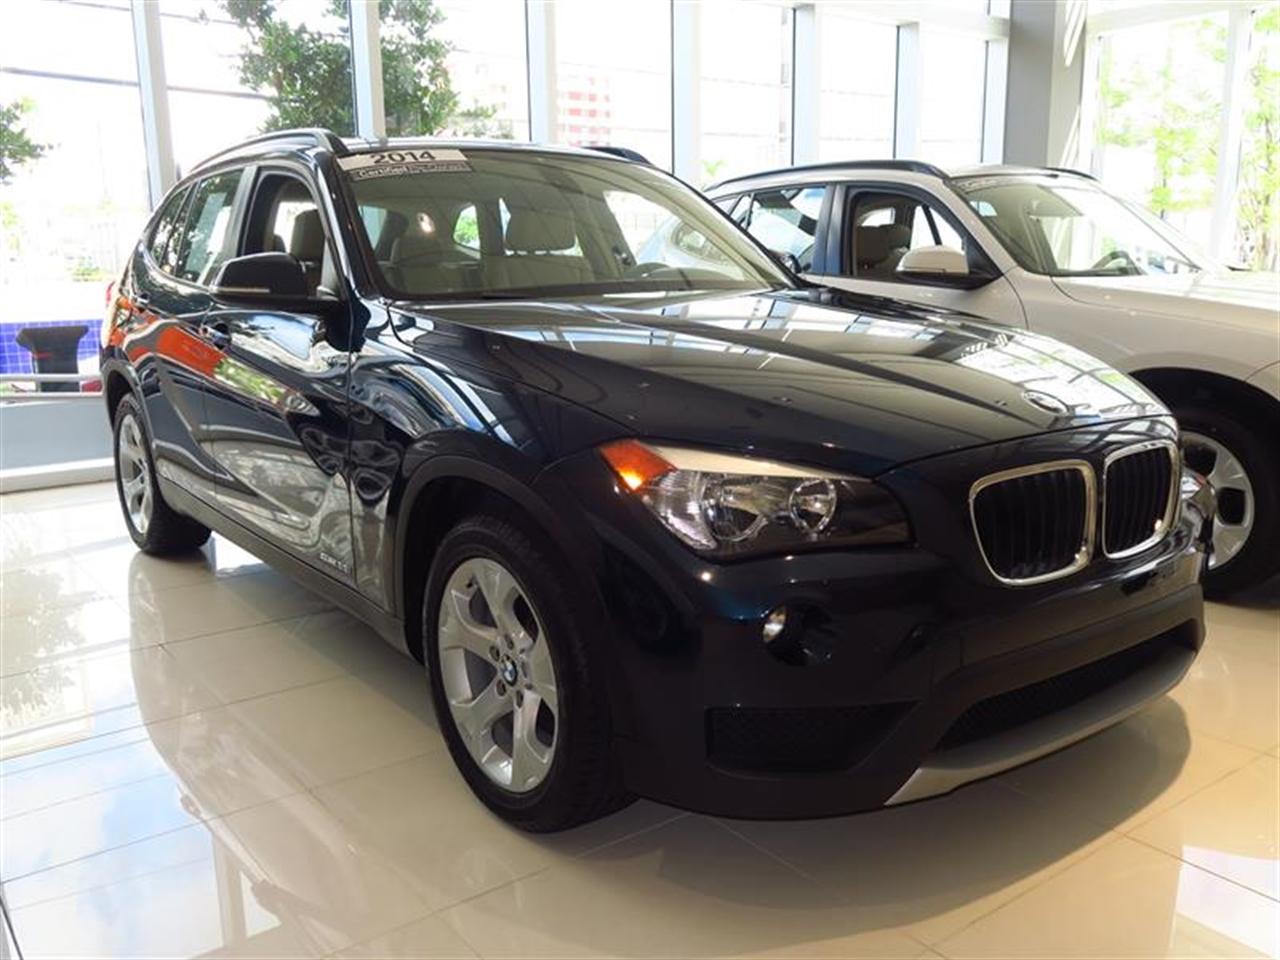 2014 BMW X1 RWD 4dr sDrive28i 3605 miles 2 Seatback Storage Pockets 3 12V DC Power Outlets LEATH